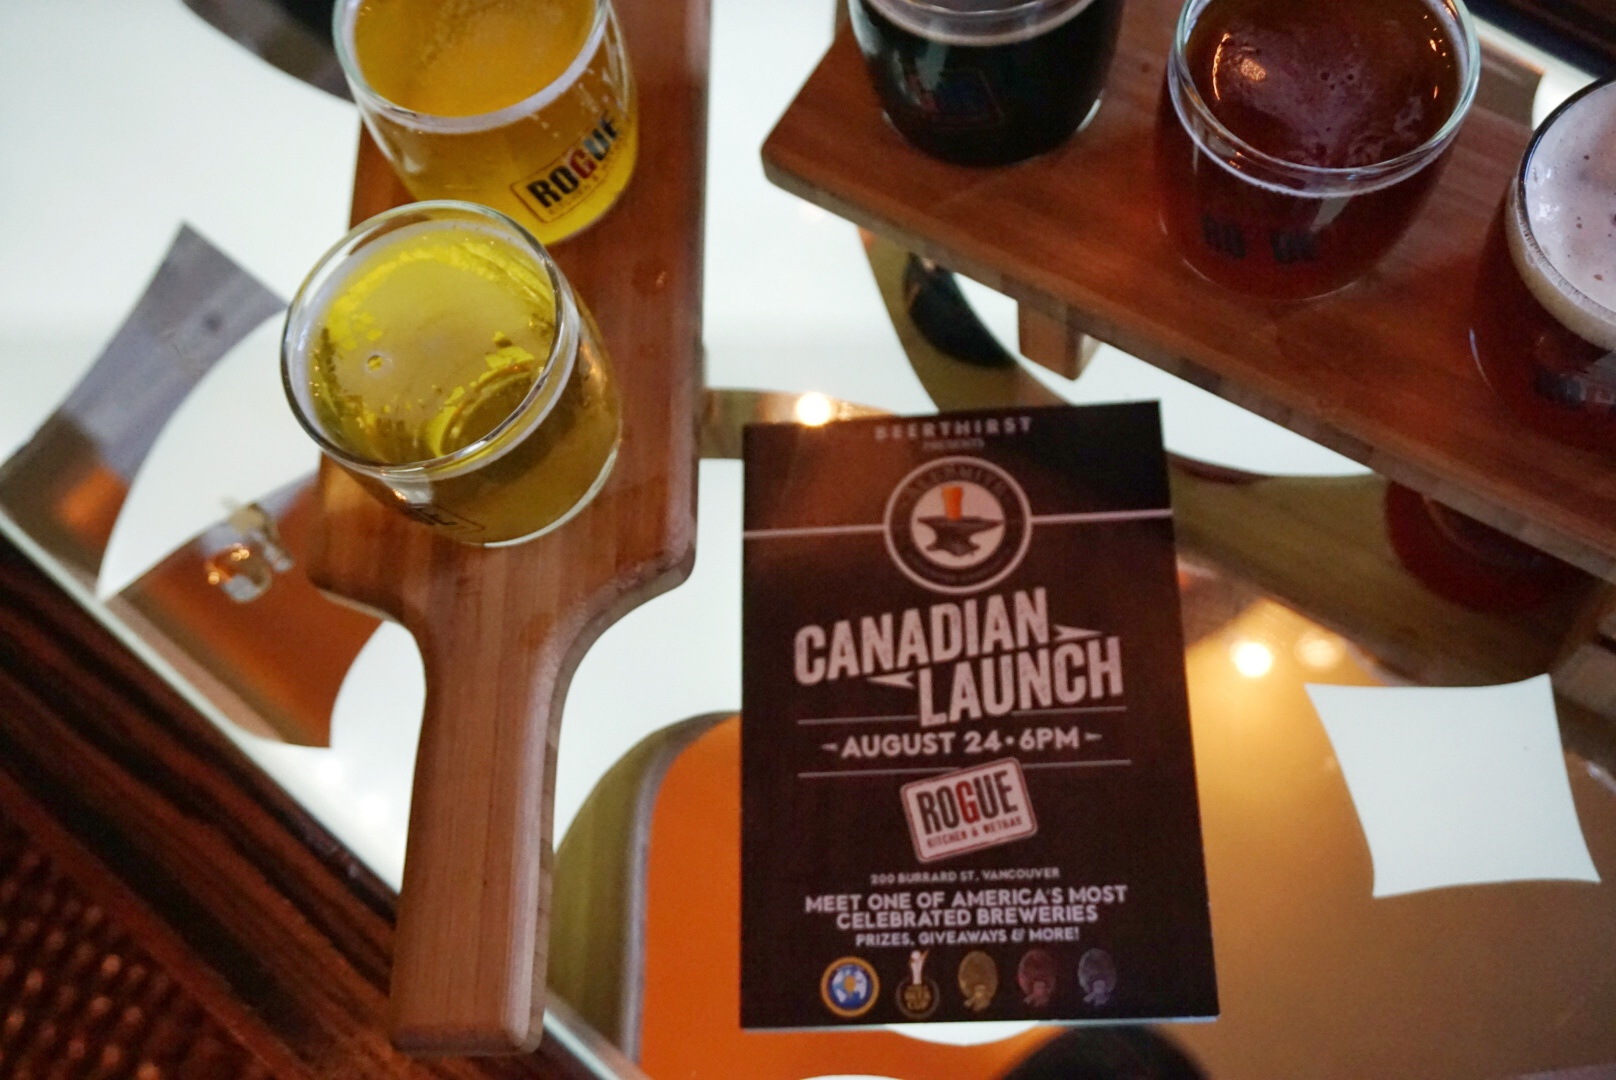 beerthirst alesmith brewing craft beer tap takeover vanpours